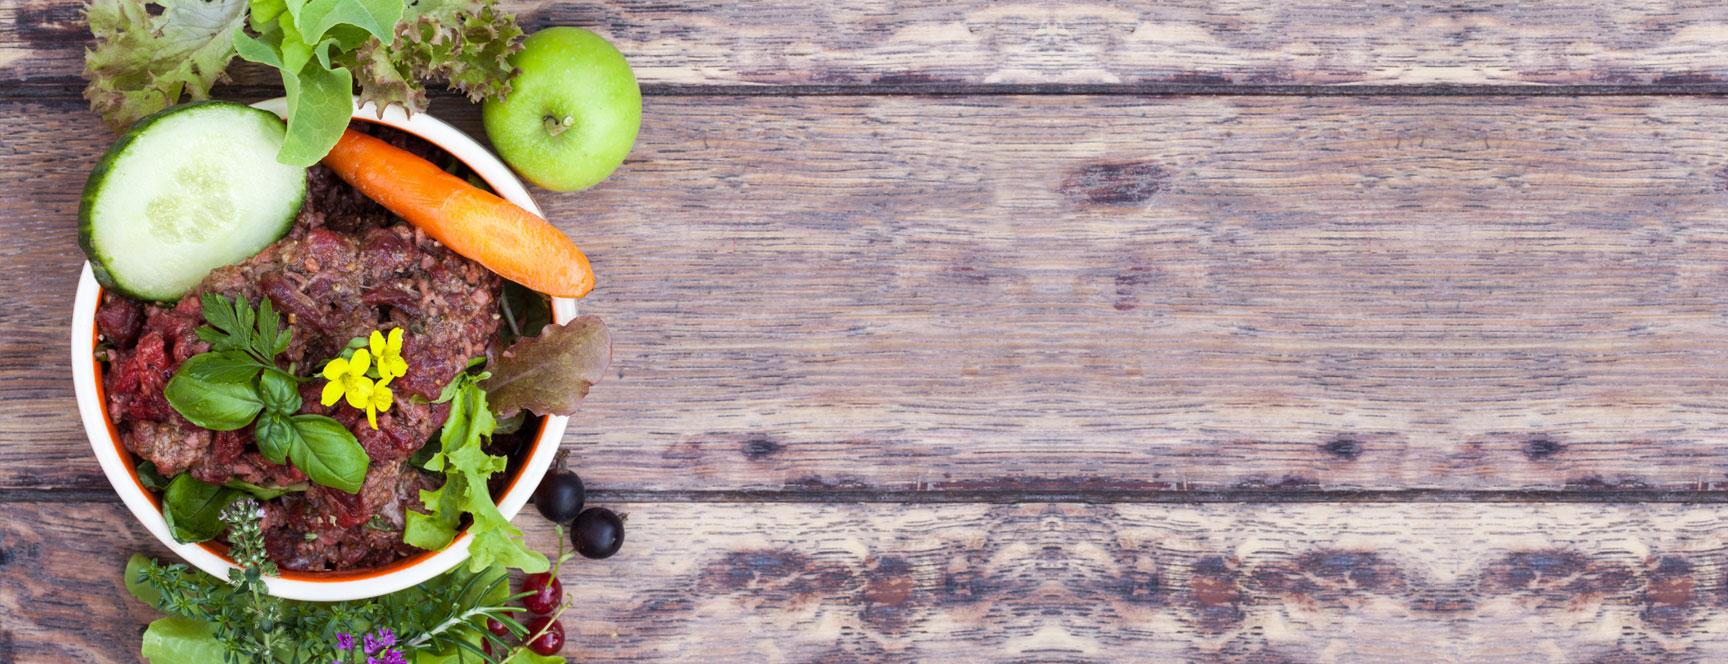 Ernährungs- und medizinische Beratung